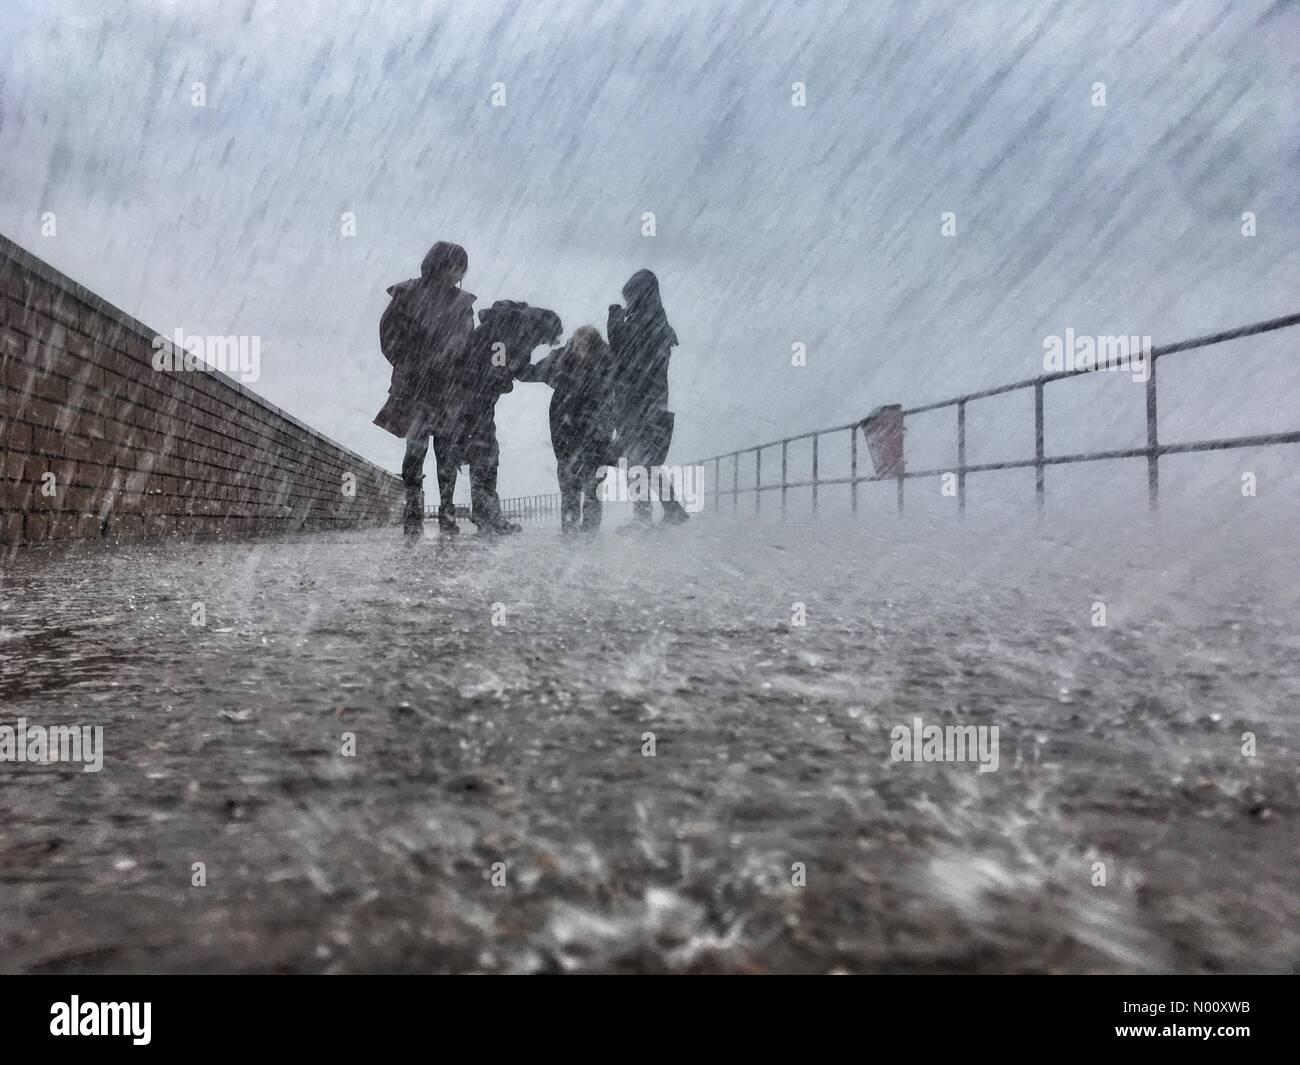 Teignmouth, Devon. 12th Oct 2018. UK Weather: Storm Callum. Soaked at Teignmouth Credit: nidpor/StockimoNews/Alamy Live News - Stock Image